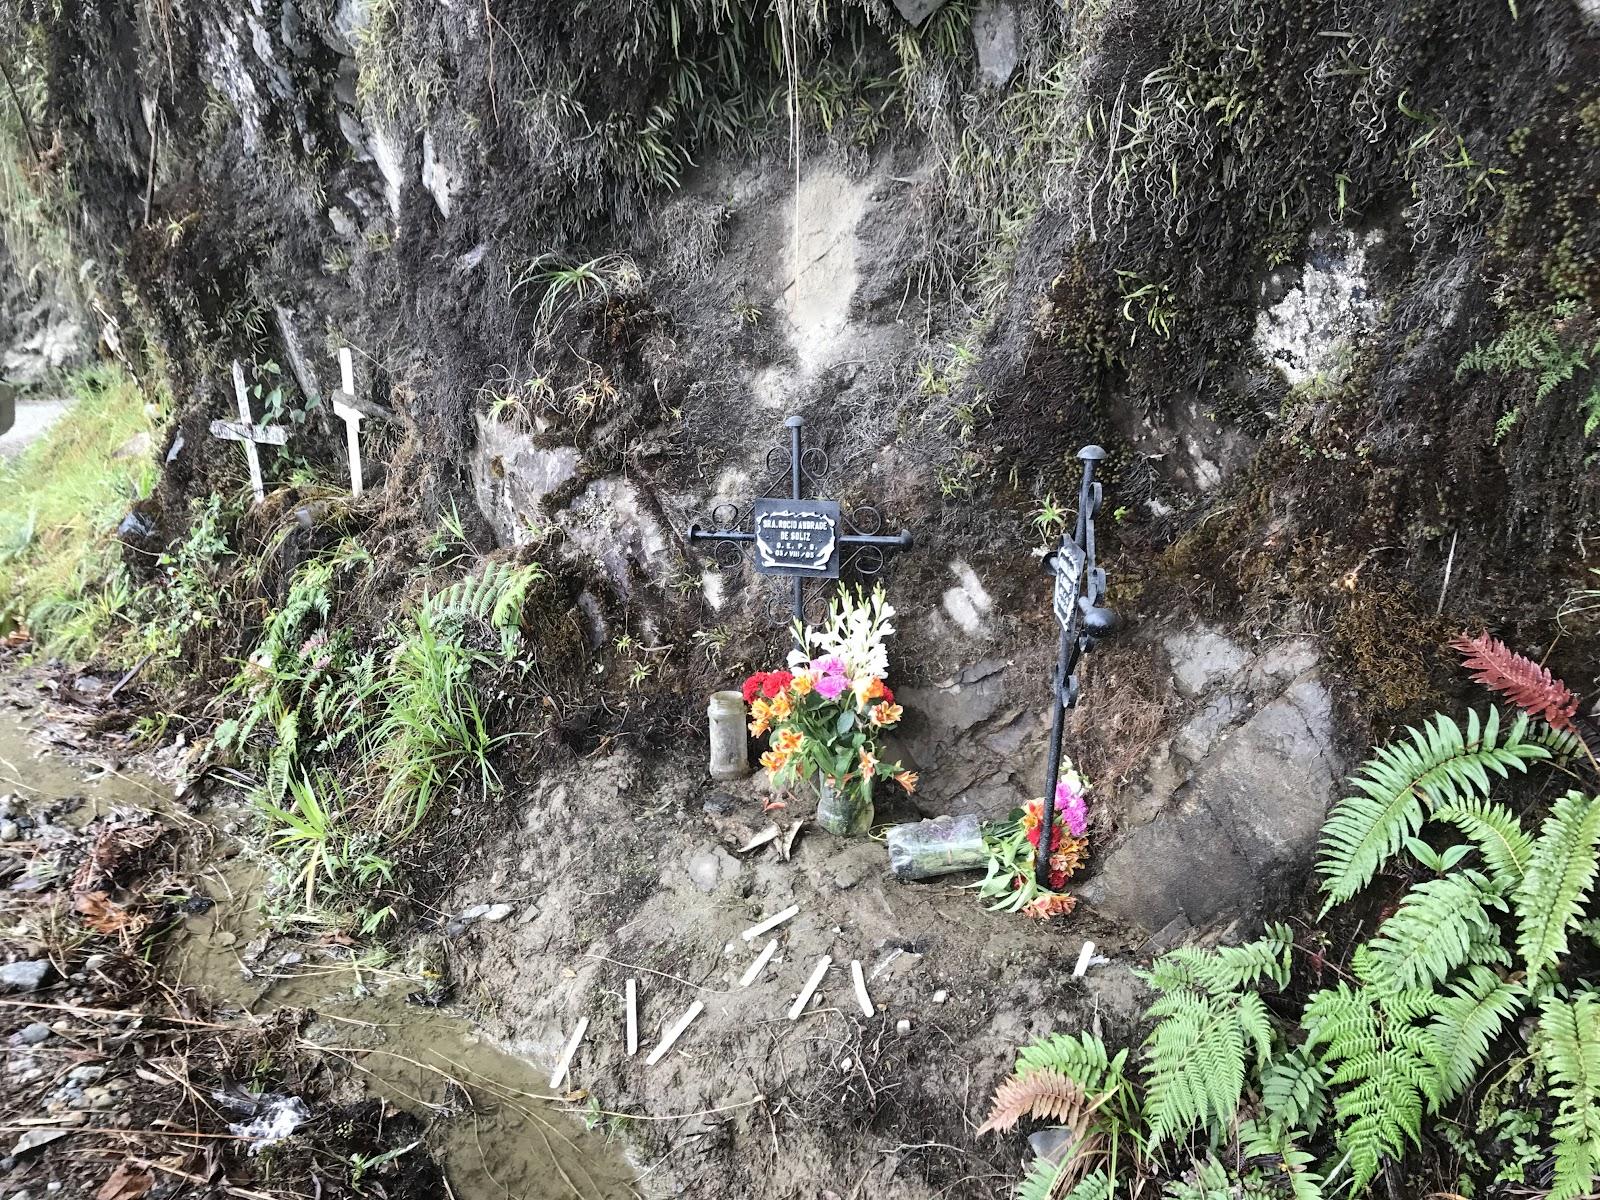 Memorial shrines on Death Road